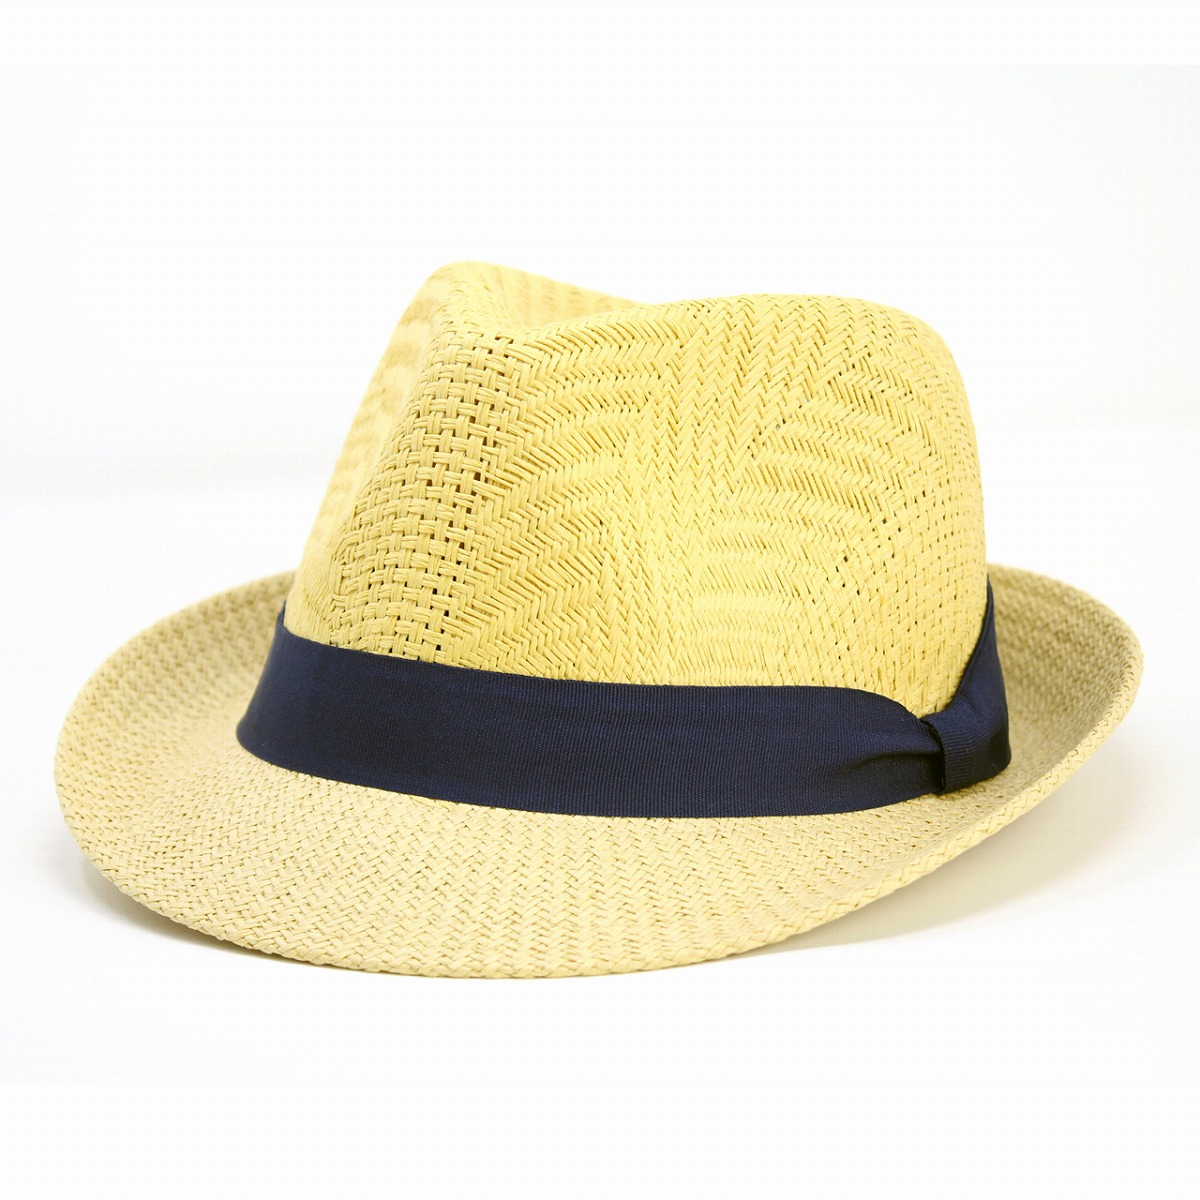 e84310c5 ELEHELM HAT STORE: Straw hat men cool soft felt hat hat straw hat ...